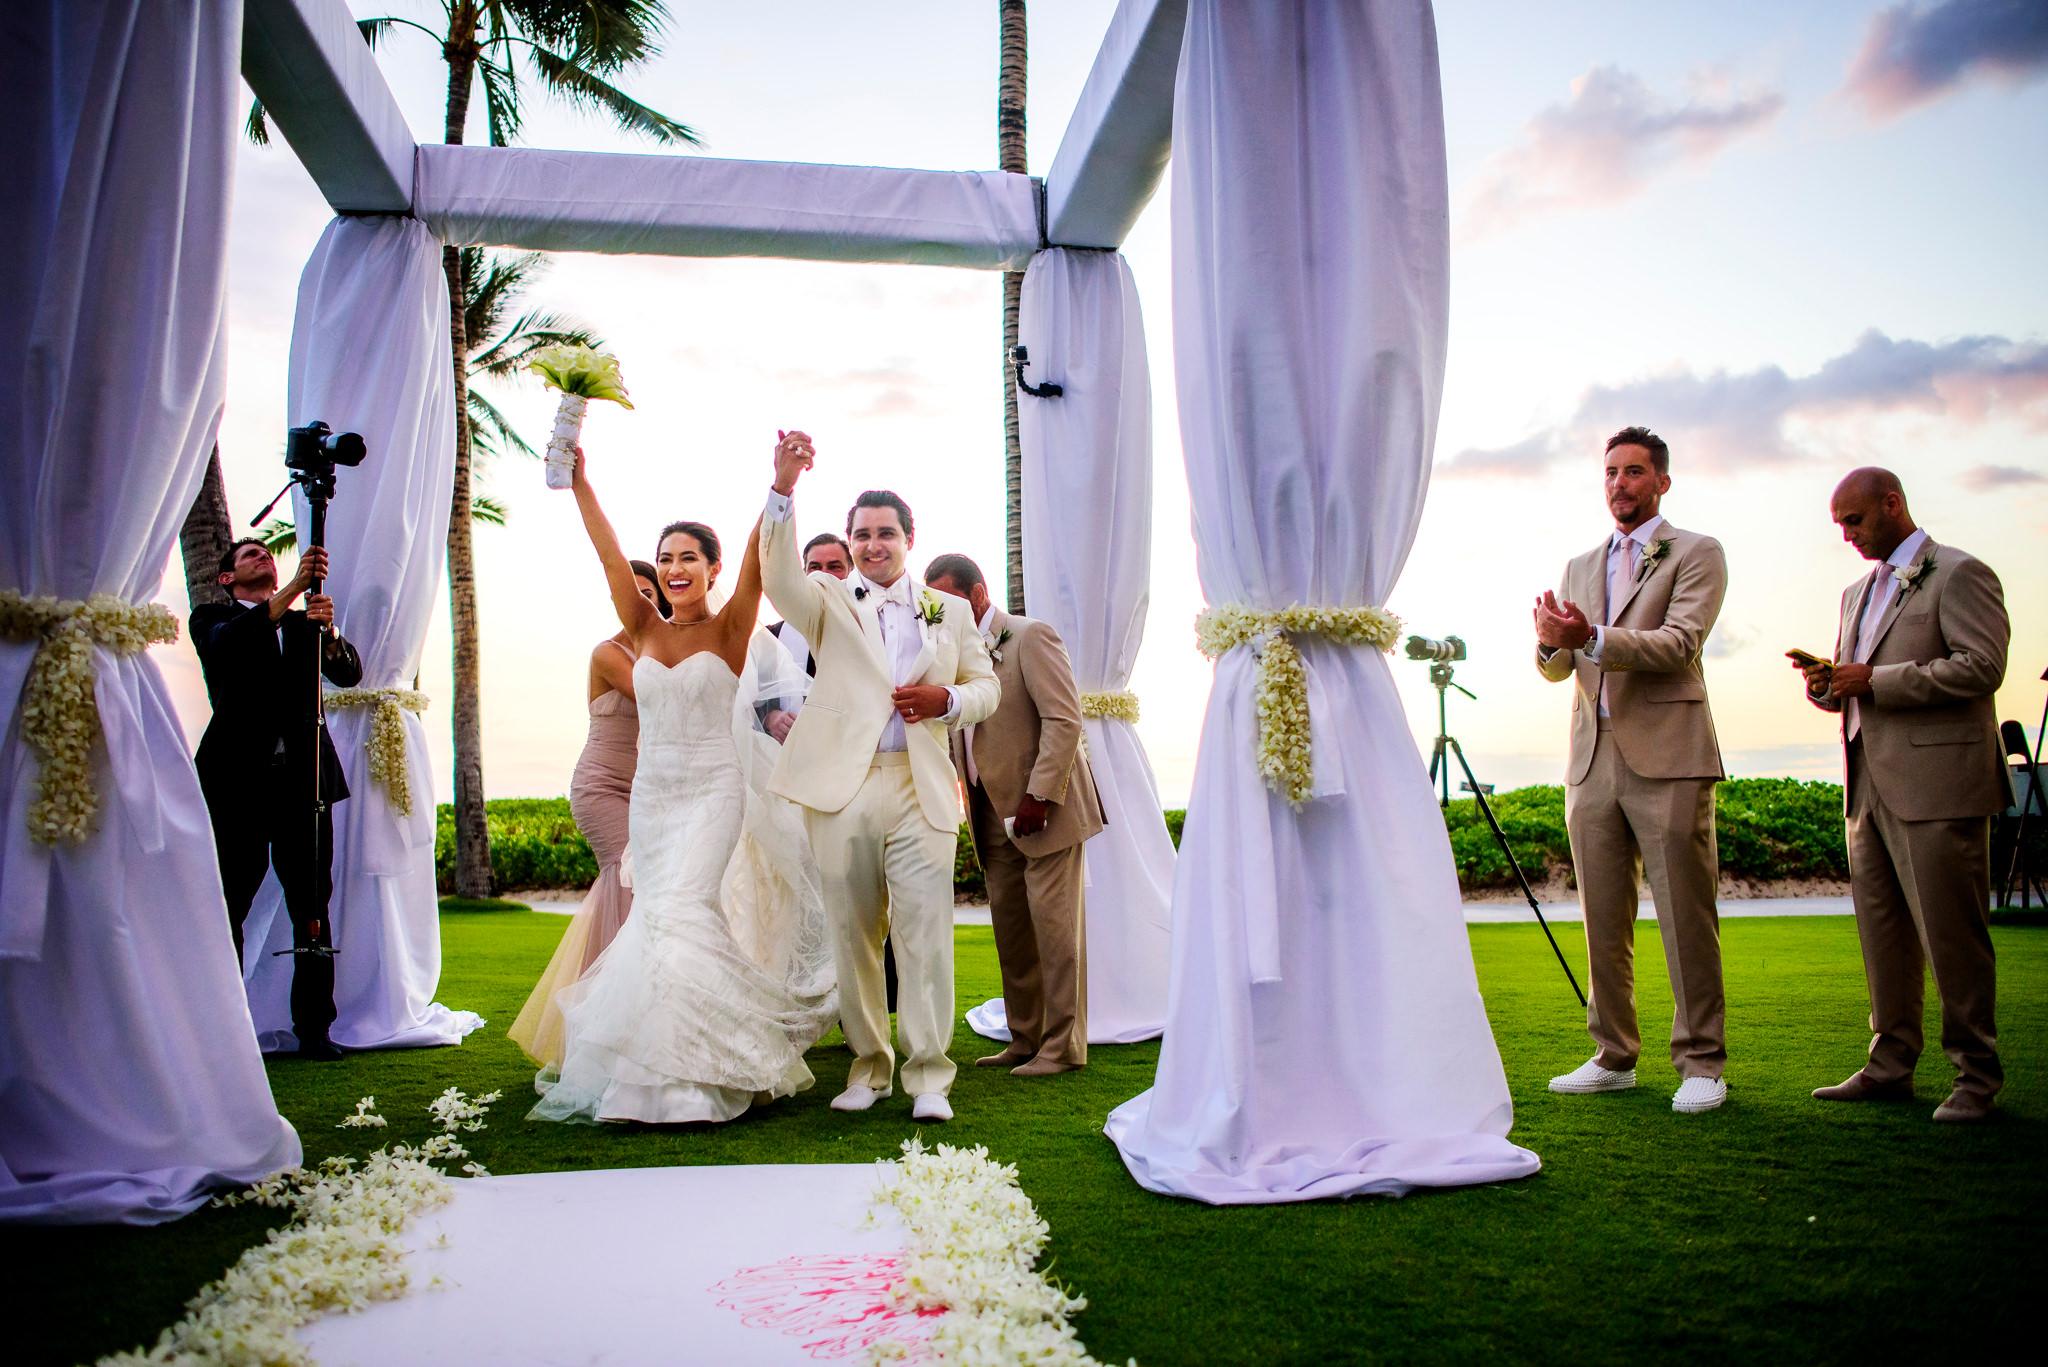 26-ashley-conner-four-seasons-resort-hualalai-wedding